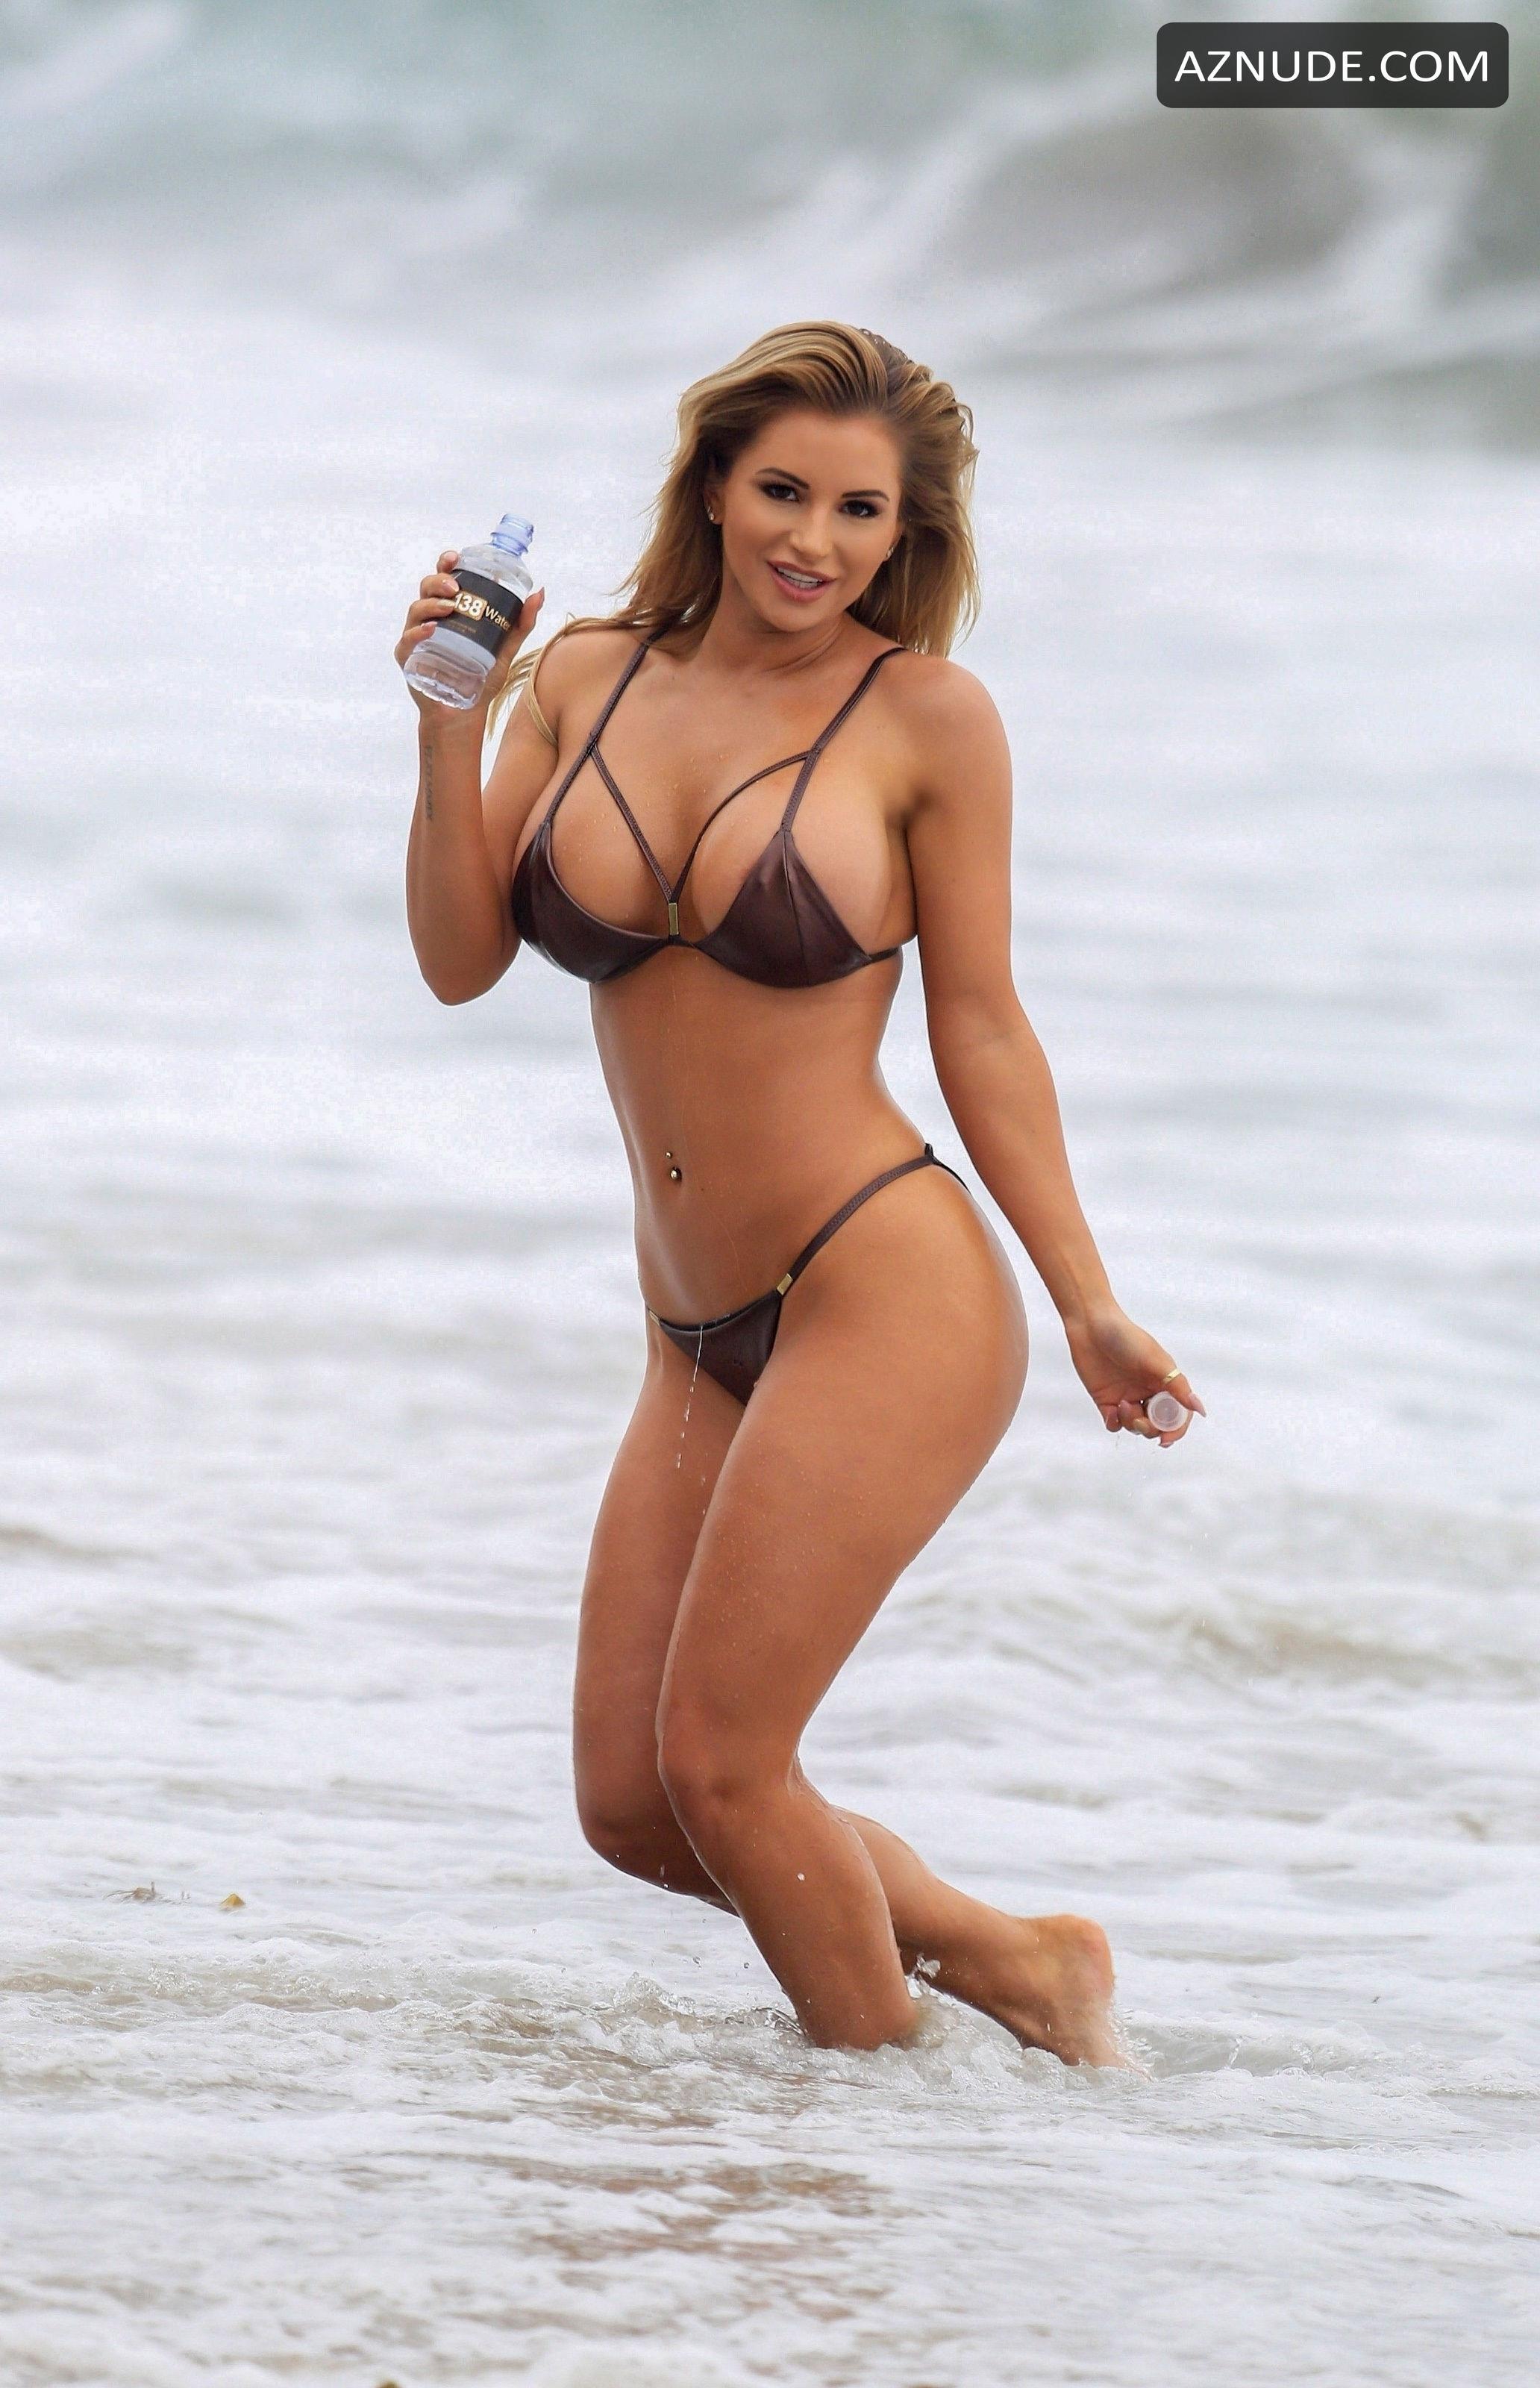 Coline Aulagnier Ass,Debora Falabella Primo Basilio - BR 2007 XXX clips Allie DeBerry Sexy -,Rosie Danvers Sexy Topless - 7 Photos